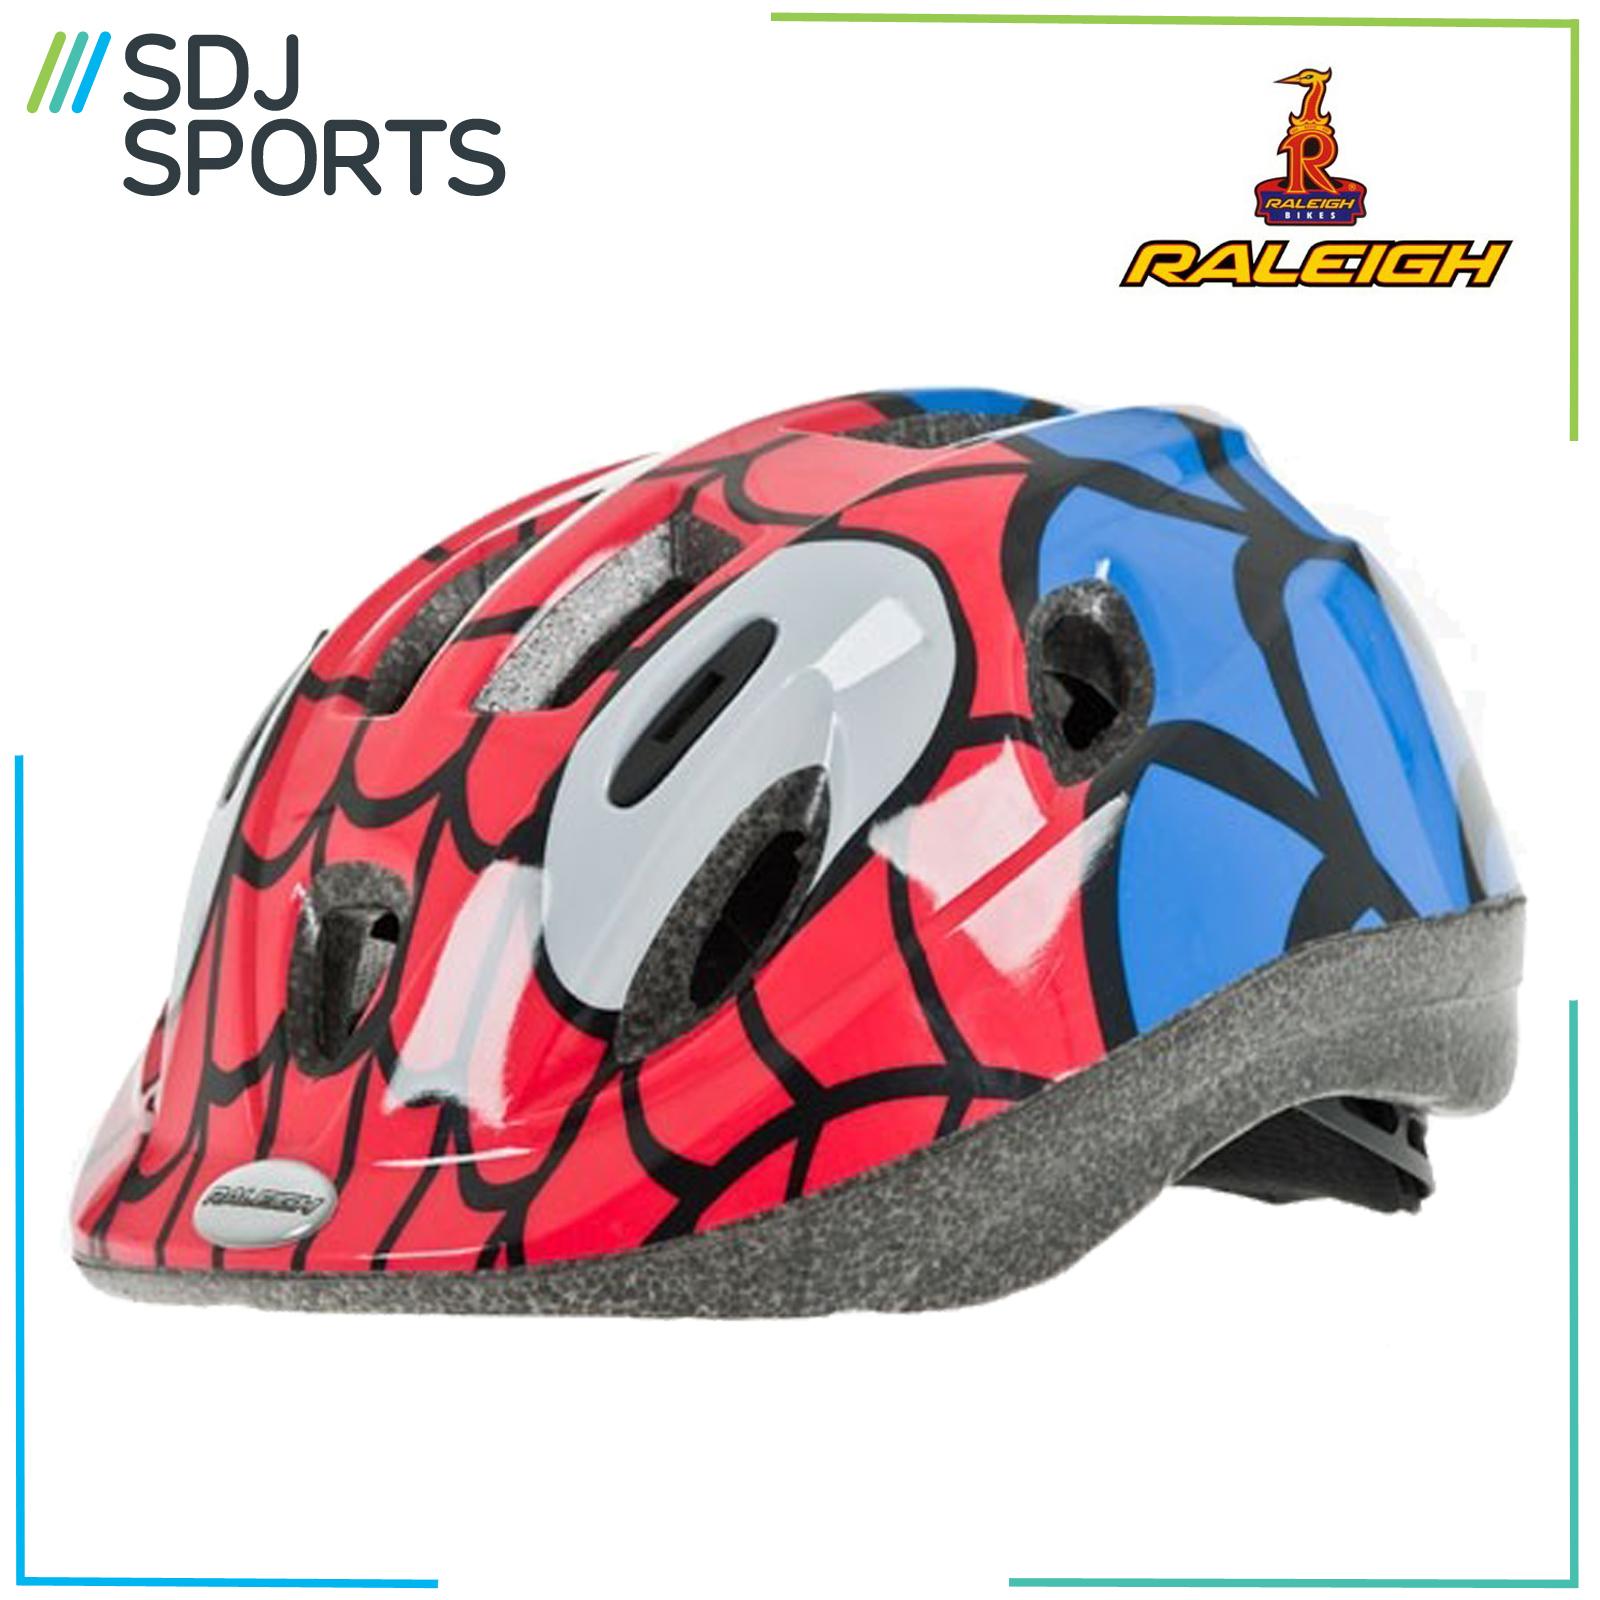 NEW Raleigh Mystery Spiderman Kids Boys Childs Cycle Bike Helmet 48-54cm